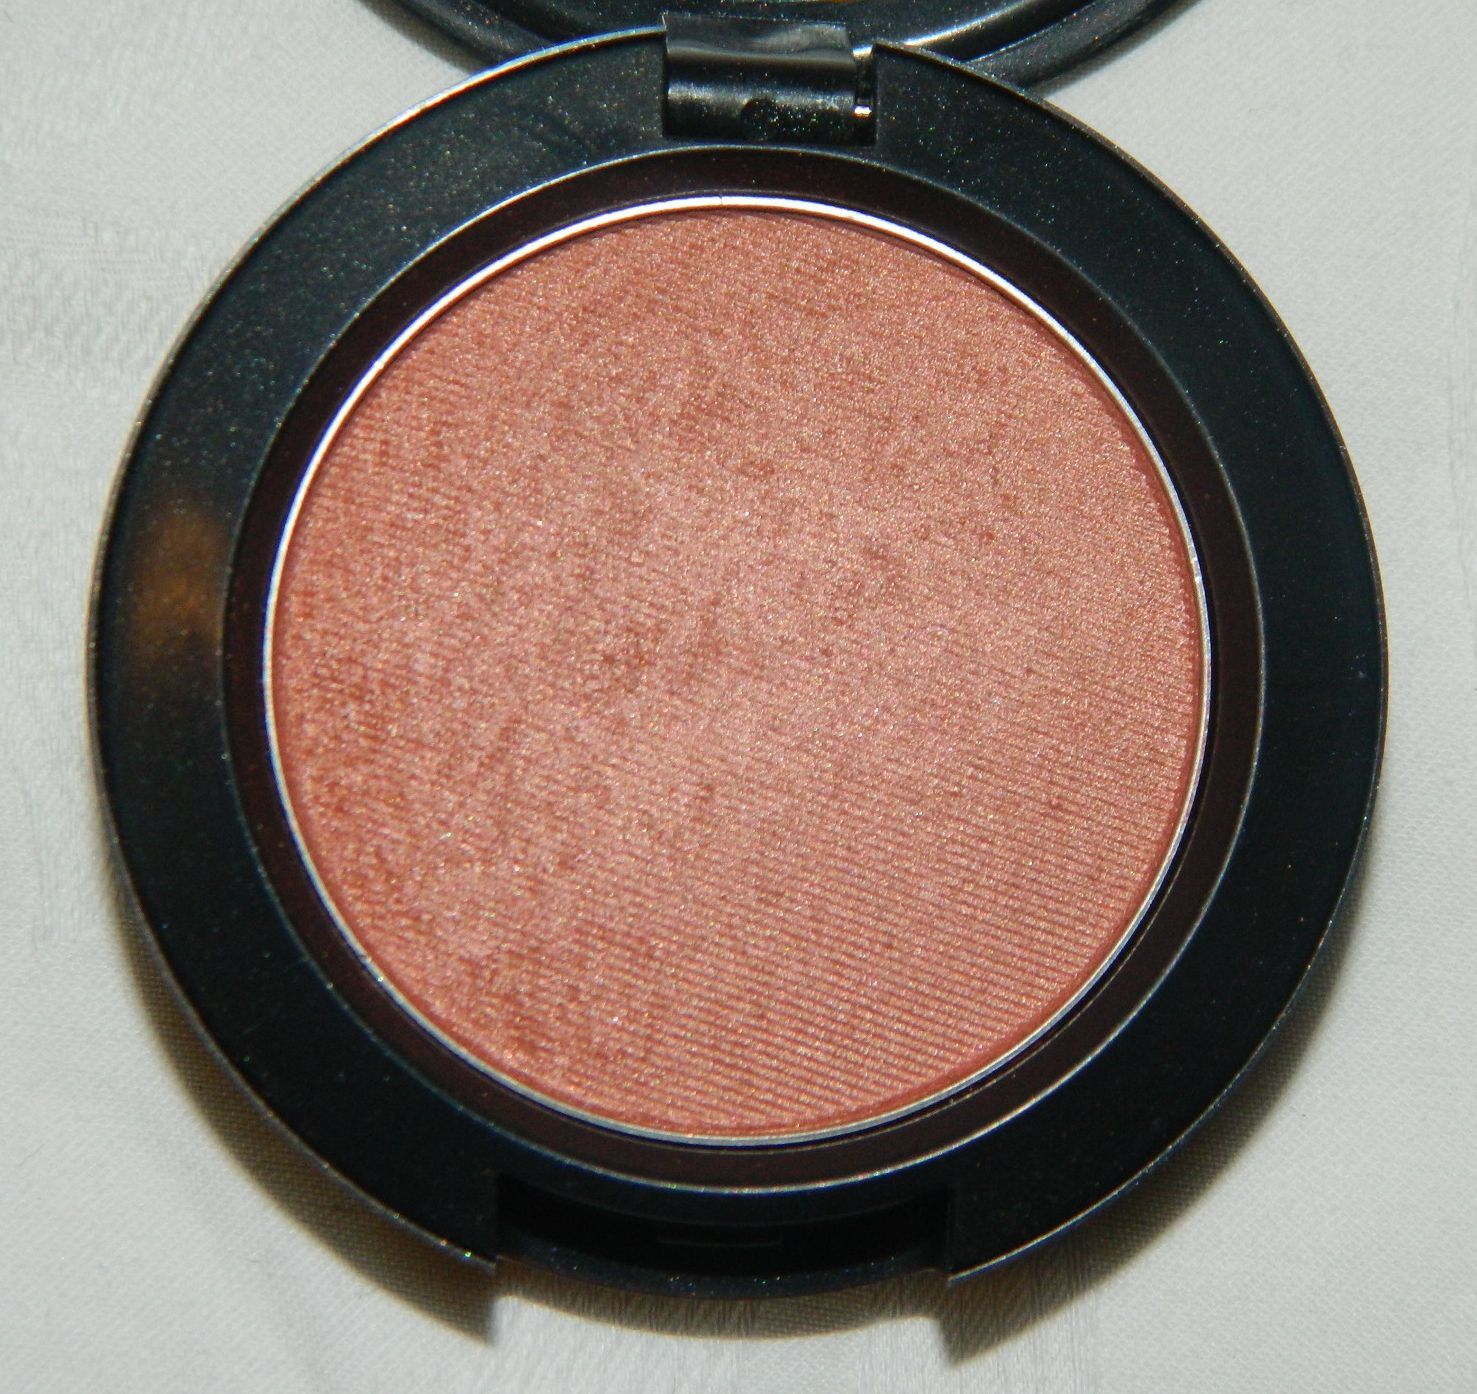 MAC Margin Powder Blush...A dirty peach color with shimmer that ...